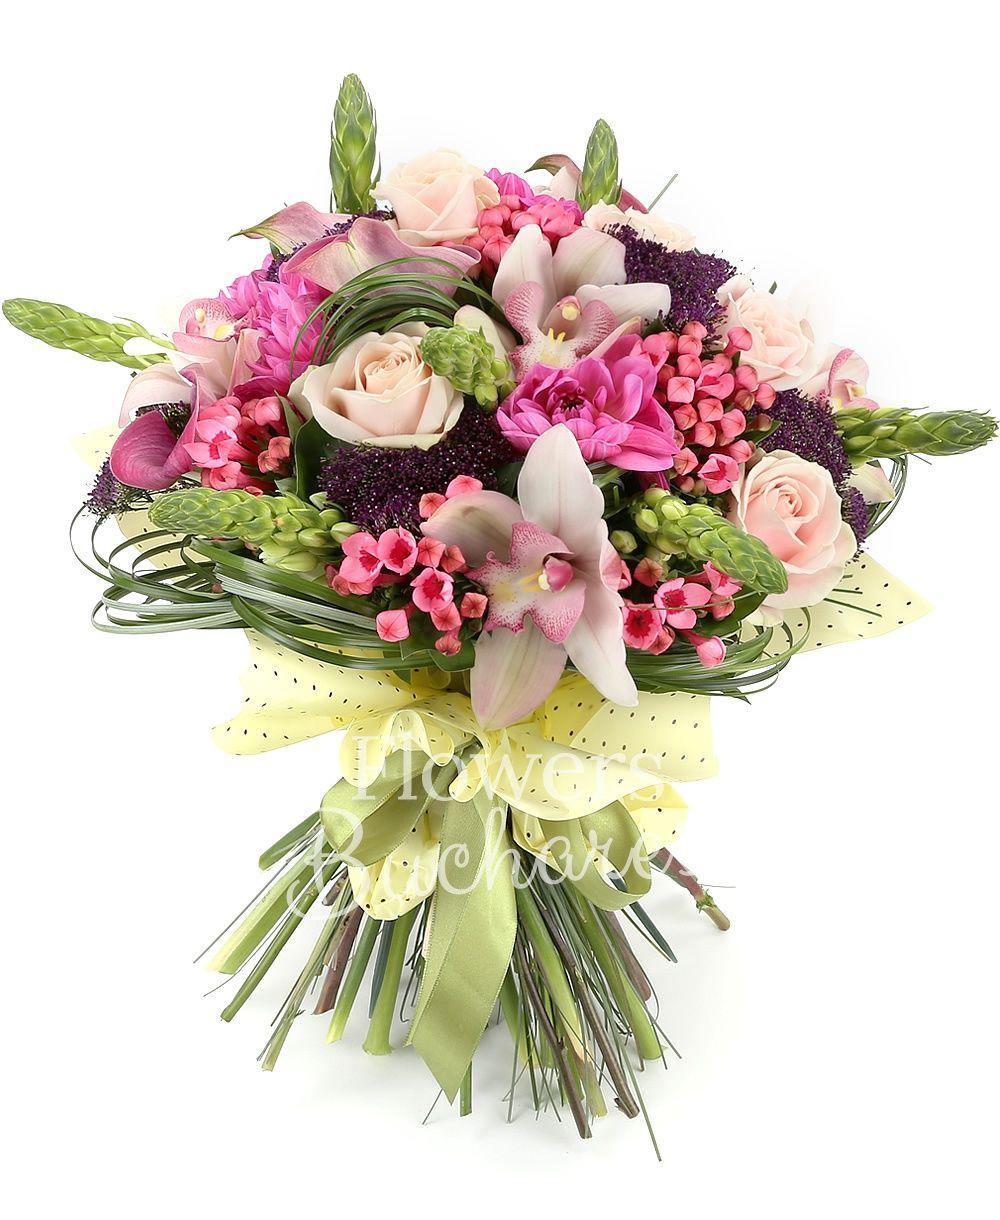 7 ornithogalum, 5 cream roses, 5 pink bouvardia, 5 purple trachelium, 5 pink cala, 5 pink dahlias, white cymbidium, greenery